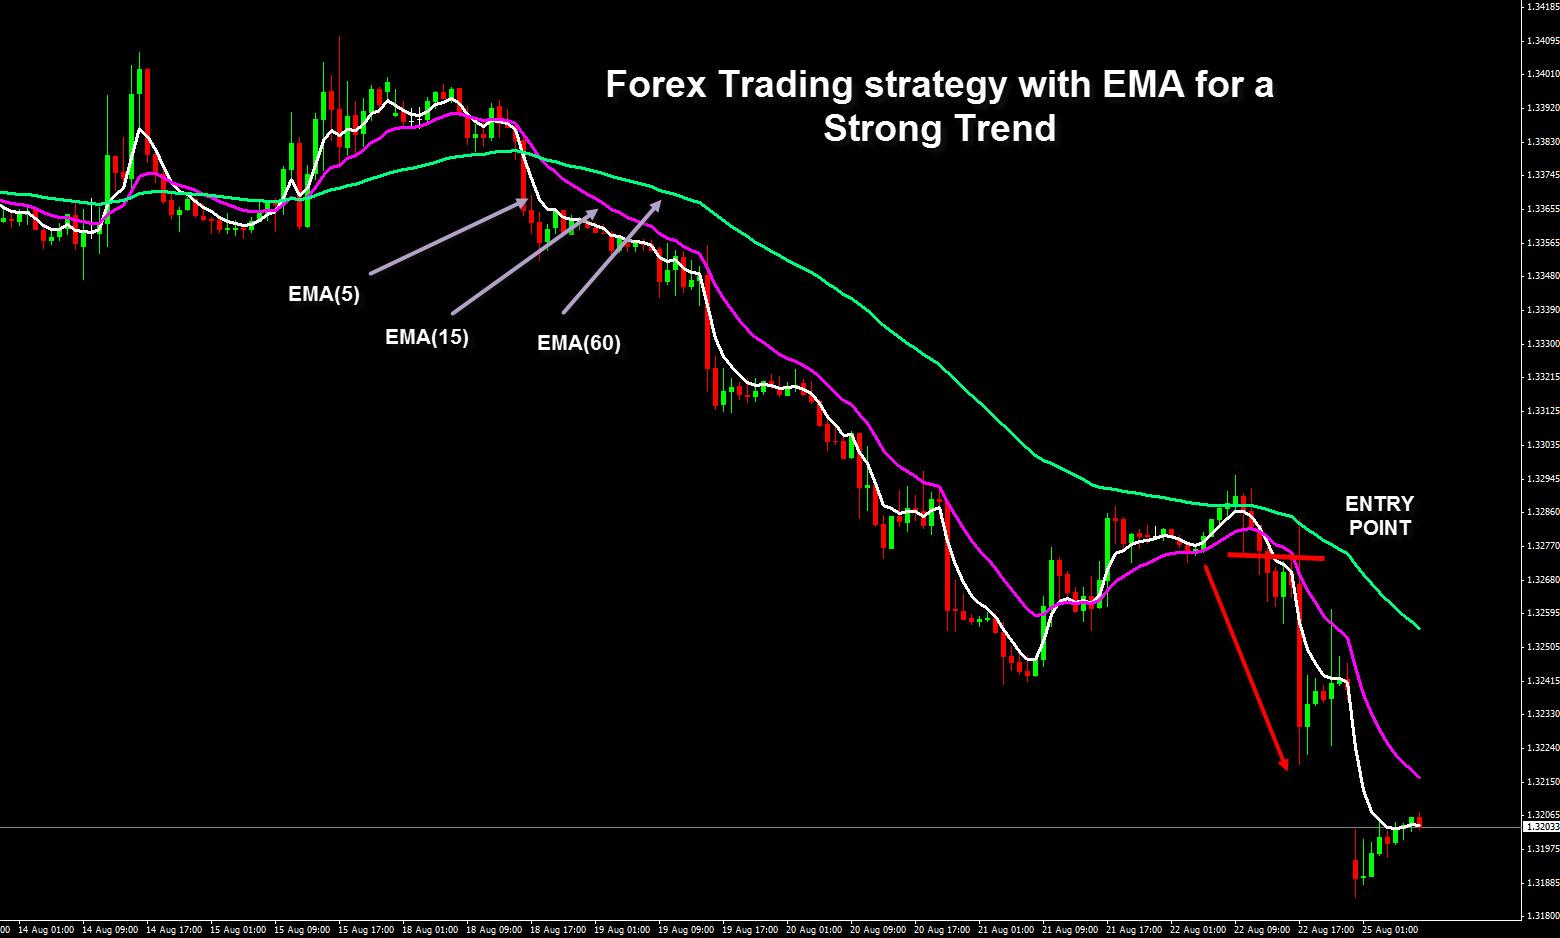 sistema di trading forex intraday trading di criptovalute 100x